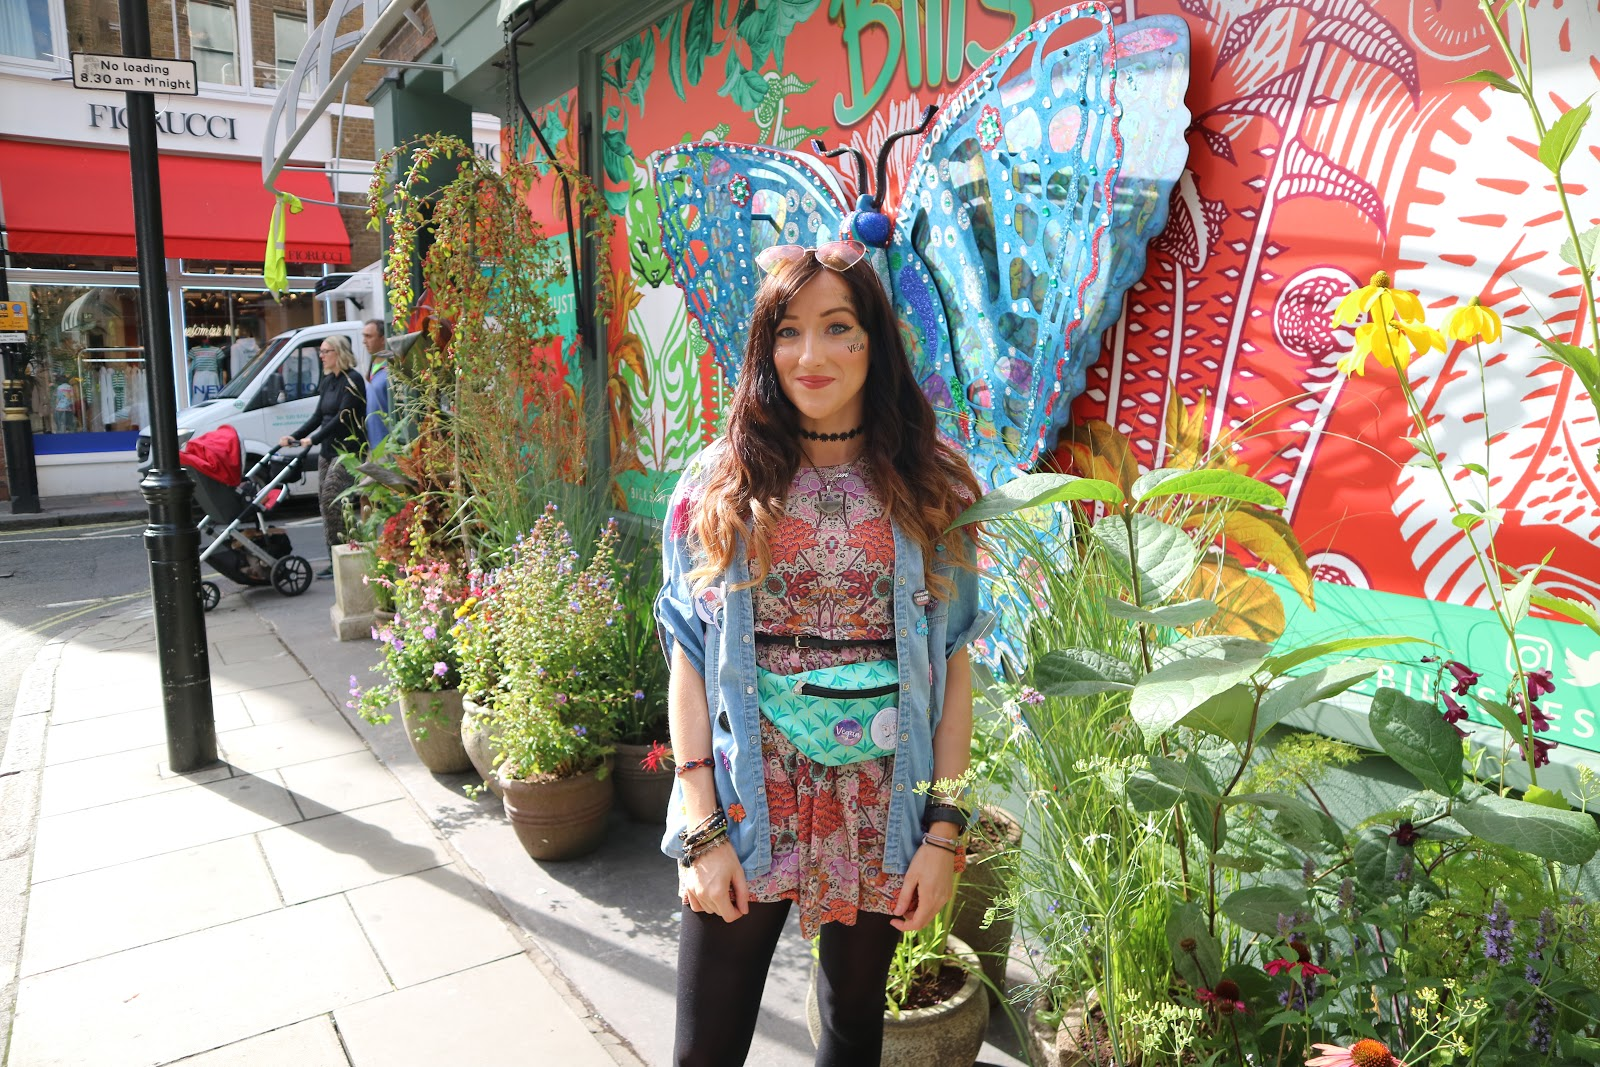 vegan fashion, blogger, Charlotte clothier, veganism